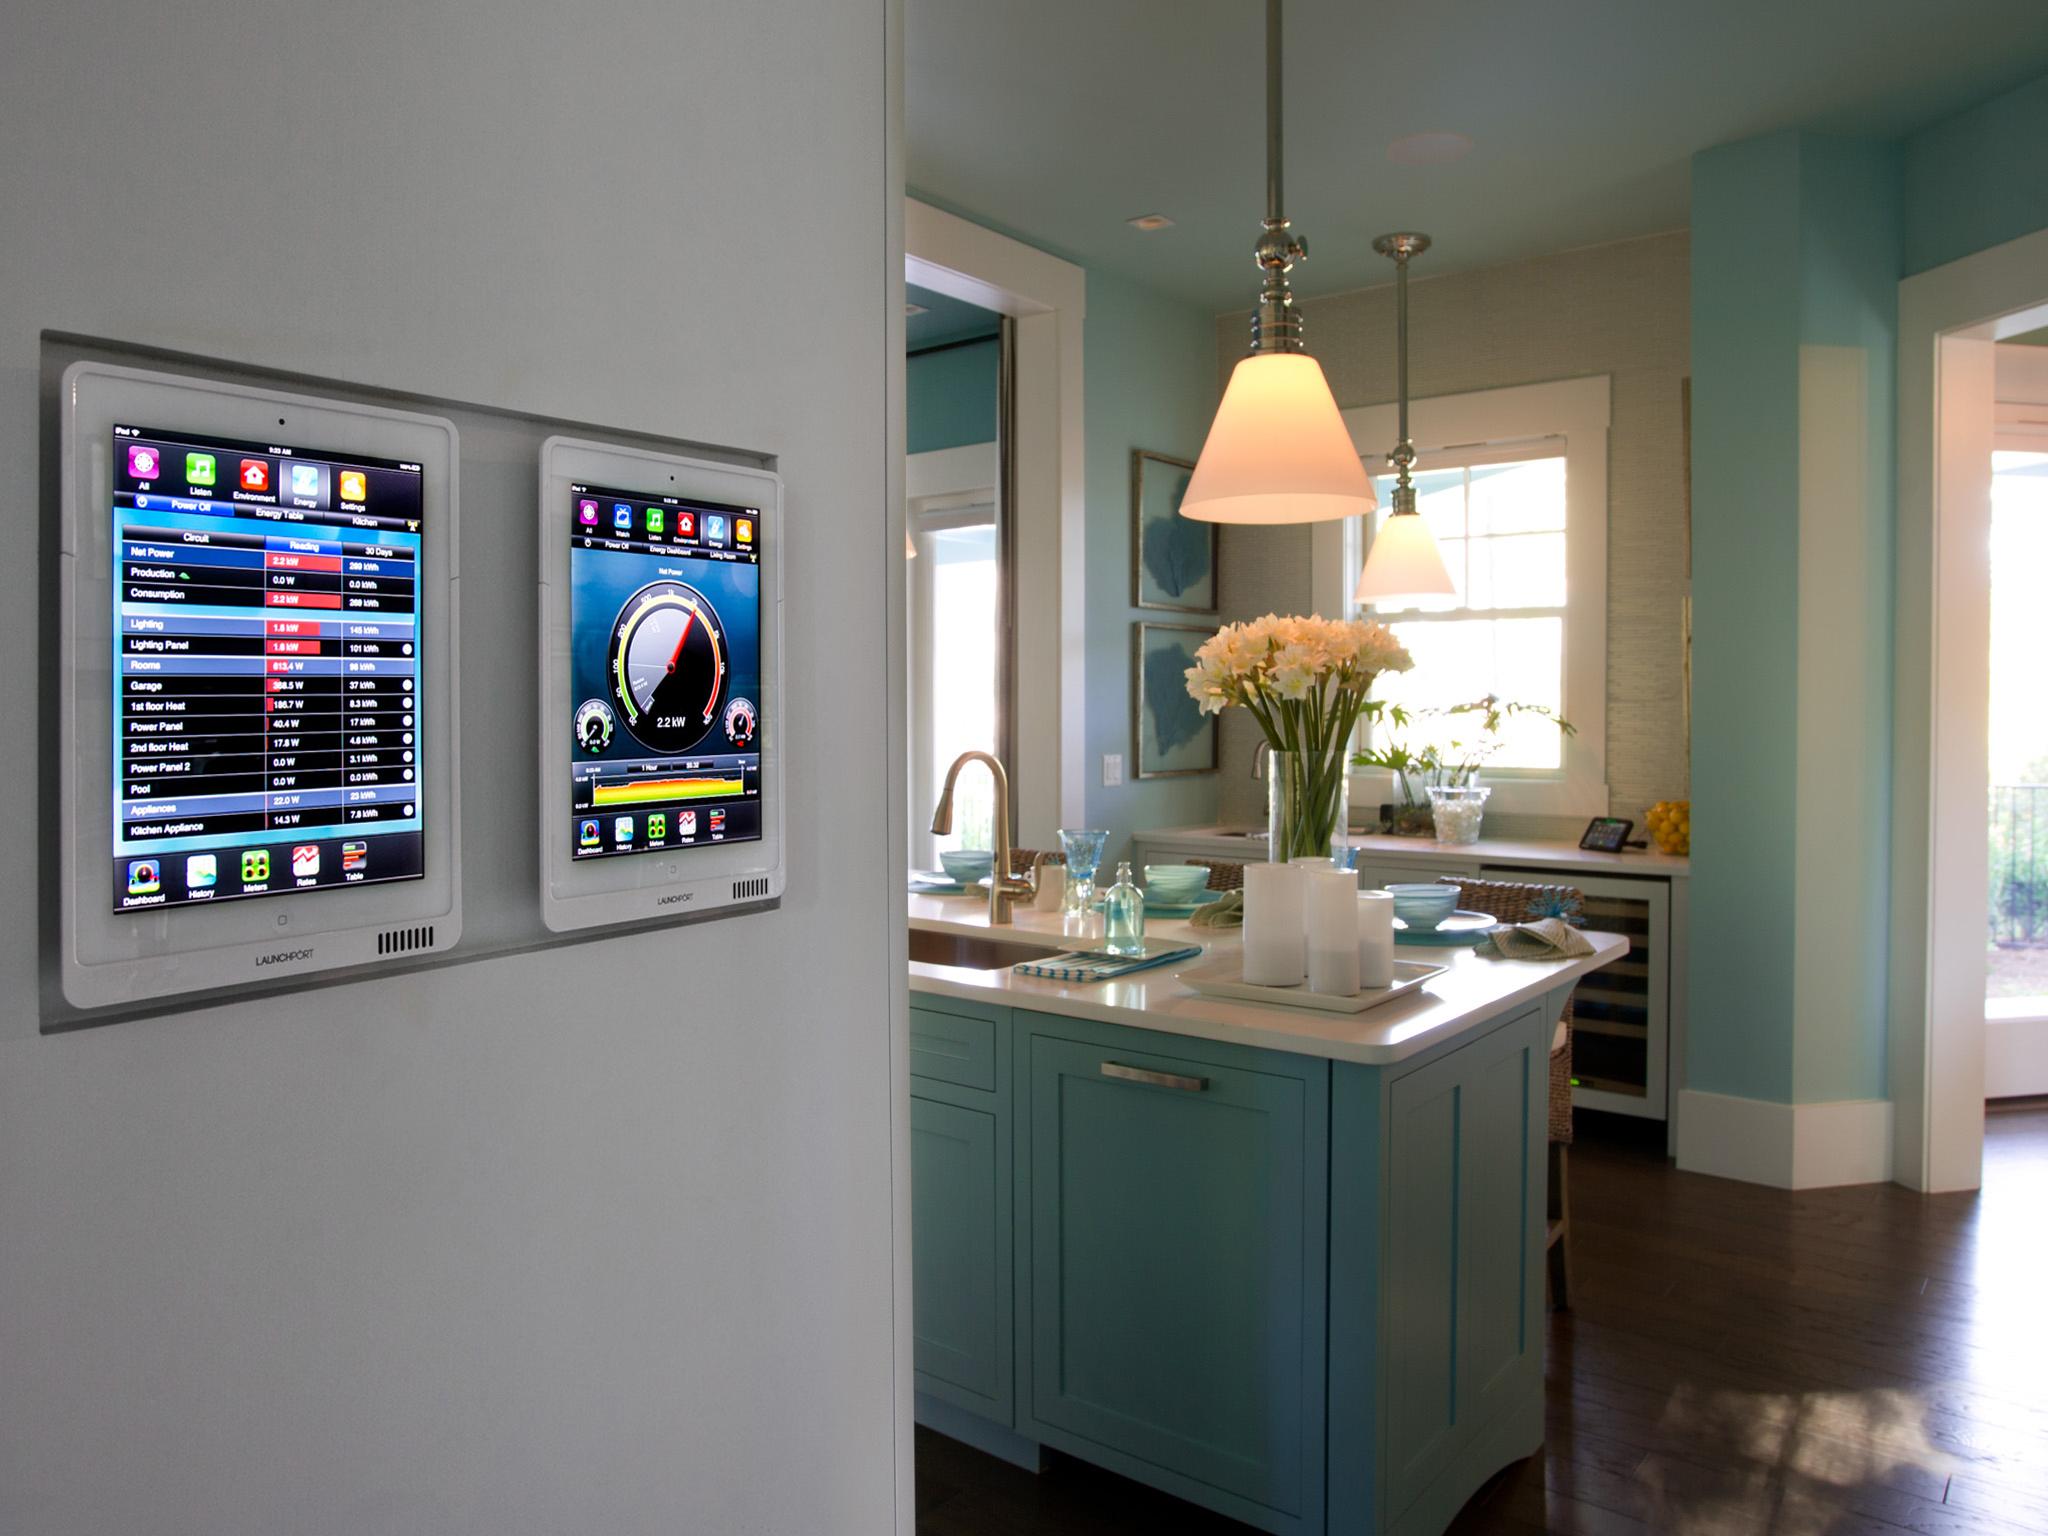 Wiring Wiring Planning Smart Home Wiring Design Smart Home System